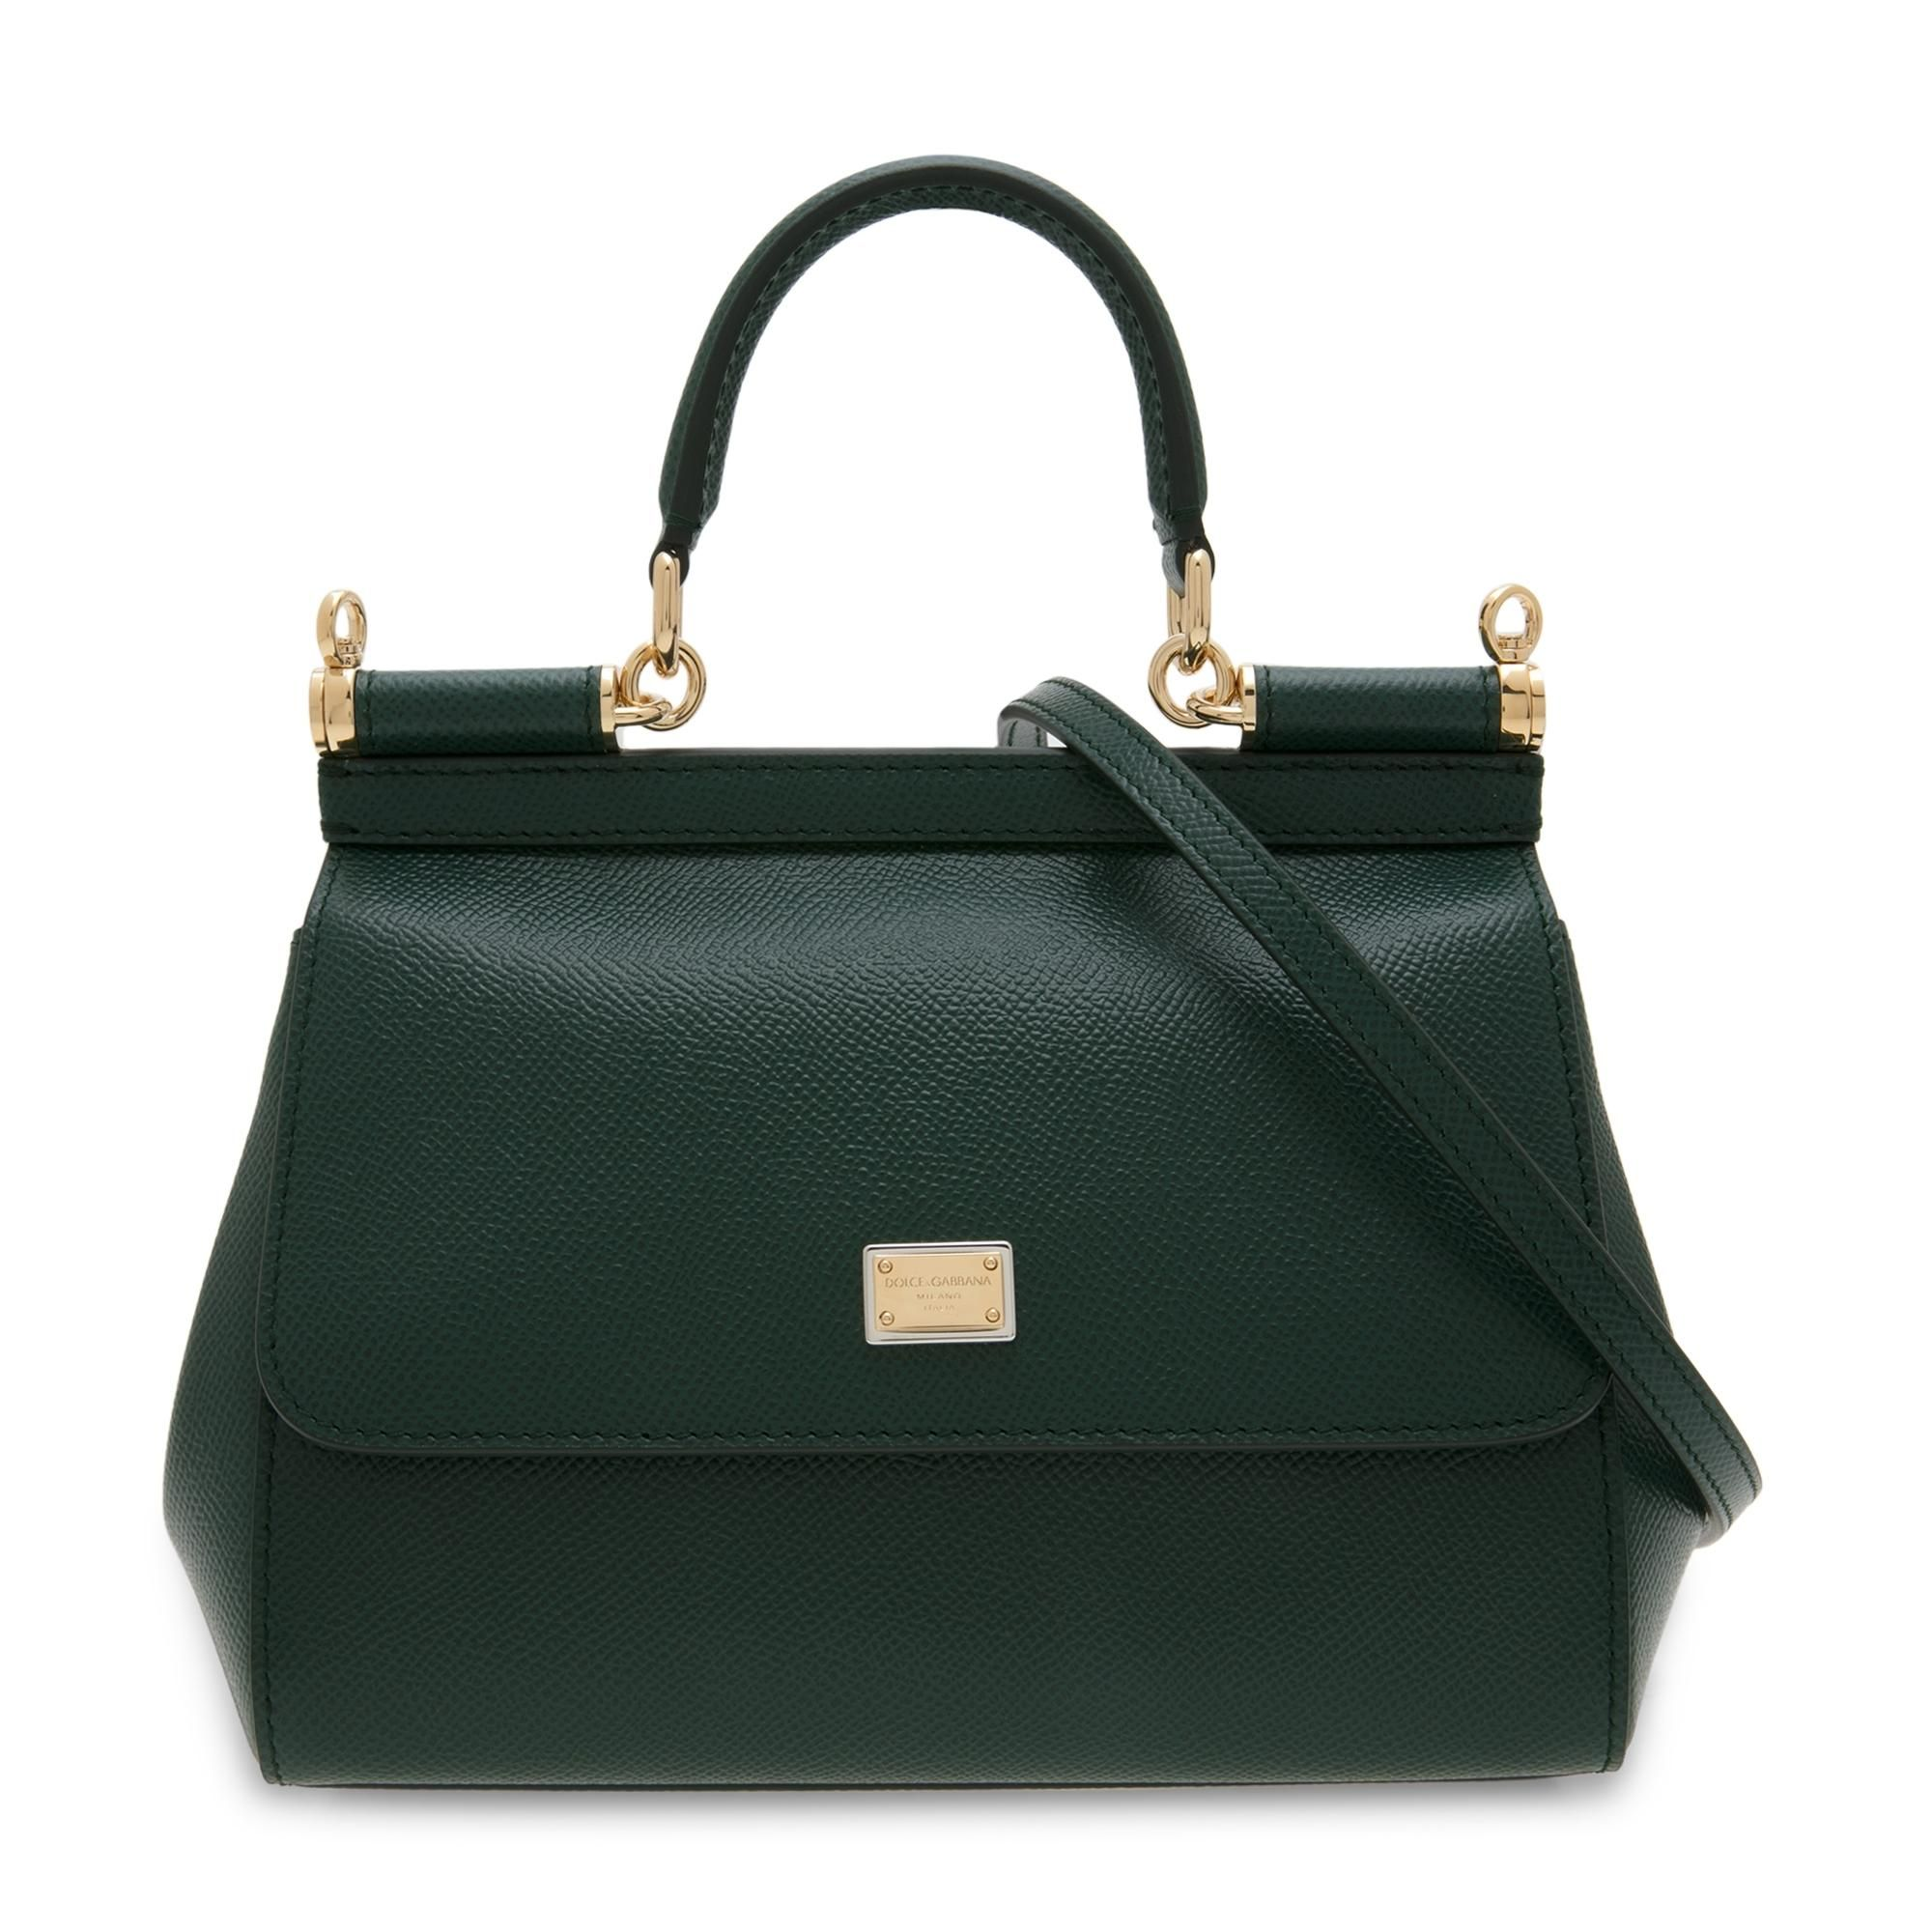 Sicily top handle bag